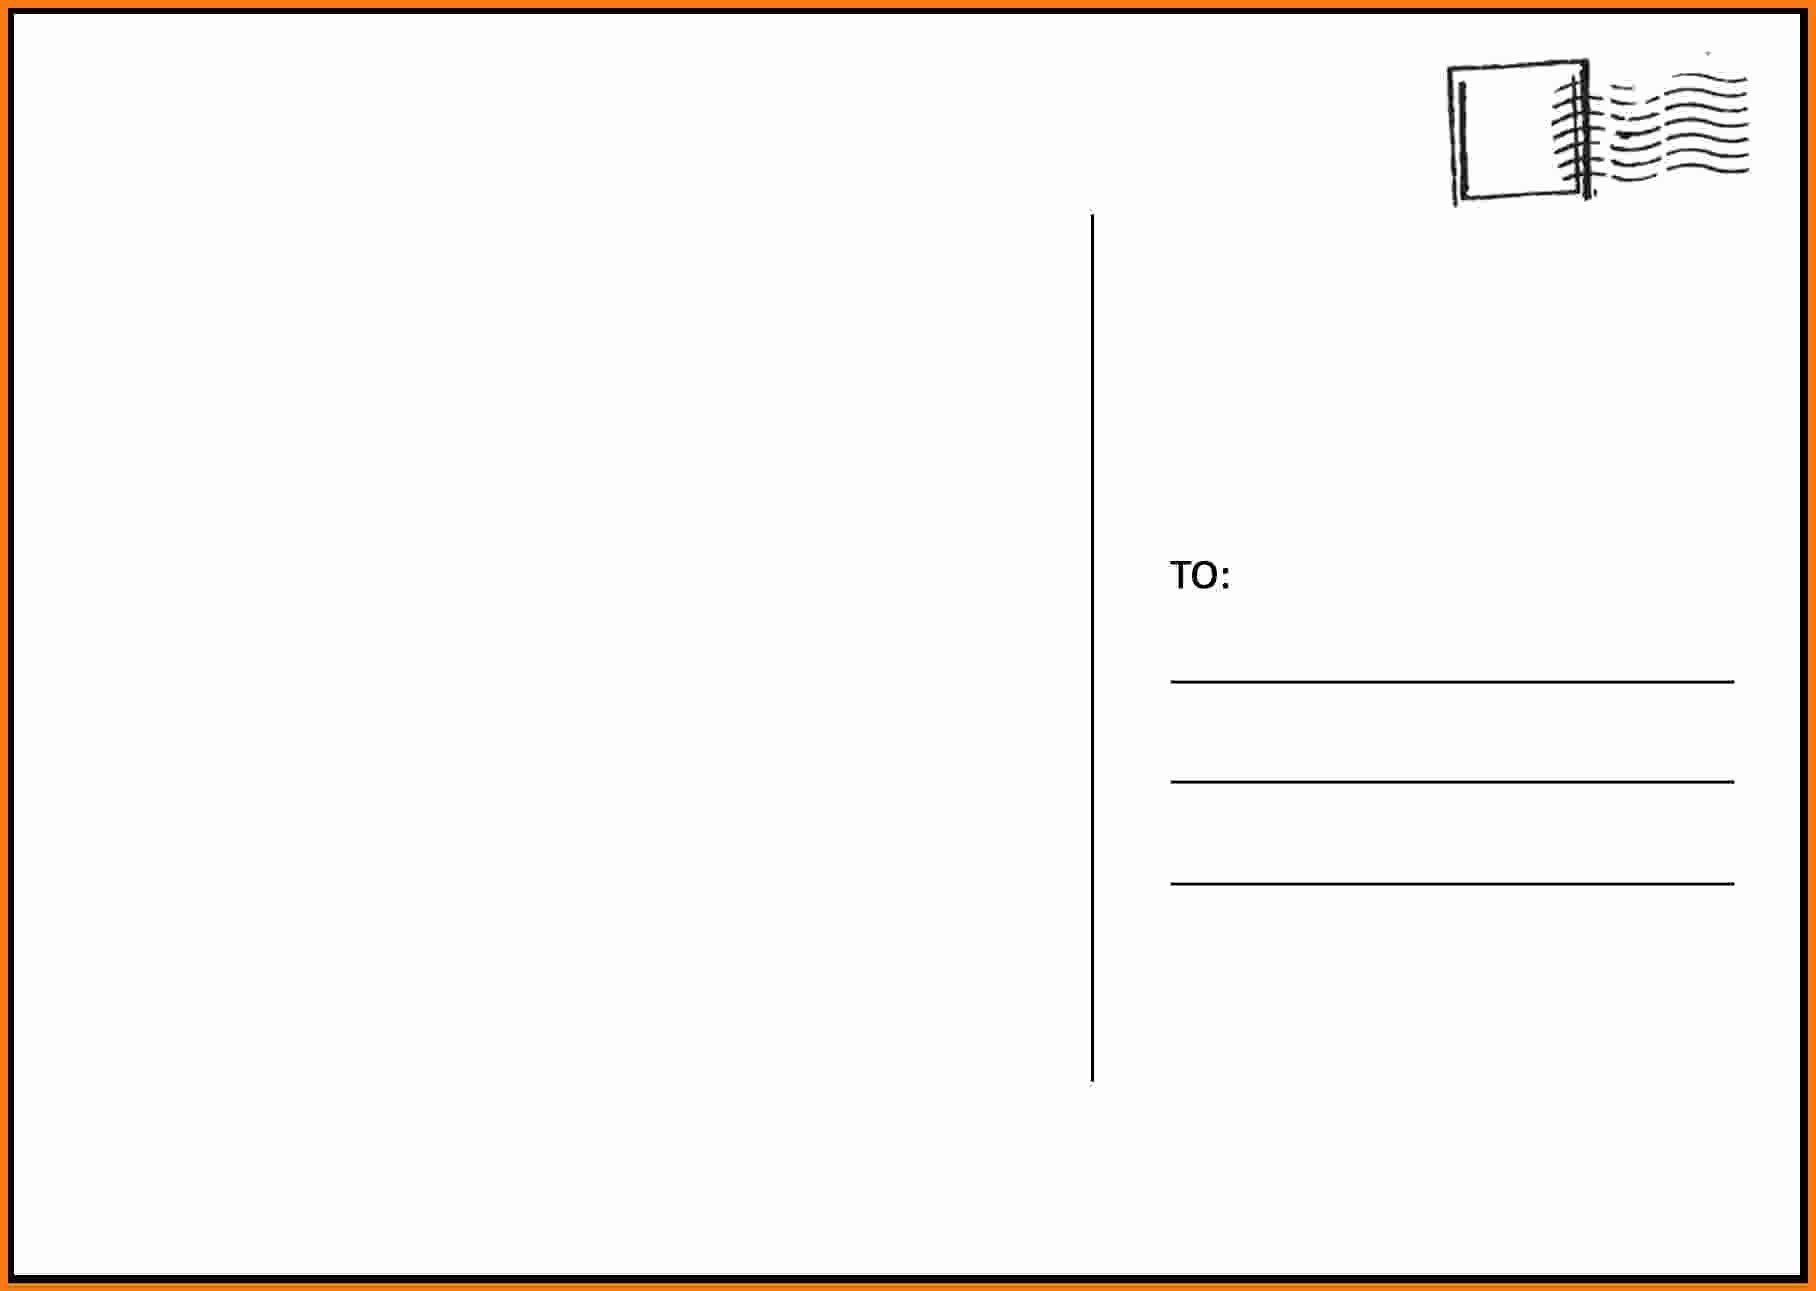 005 Breathtaking 5 X 7 Postcard Template Microsoft Word High Def Full